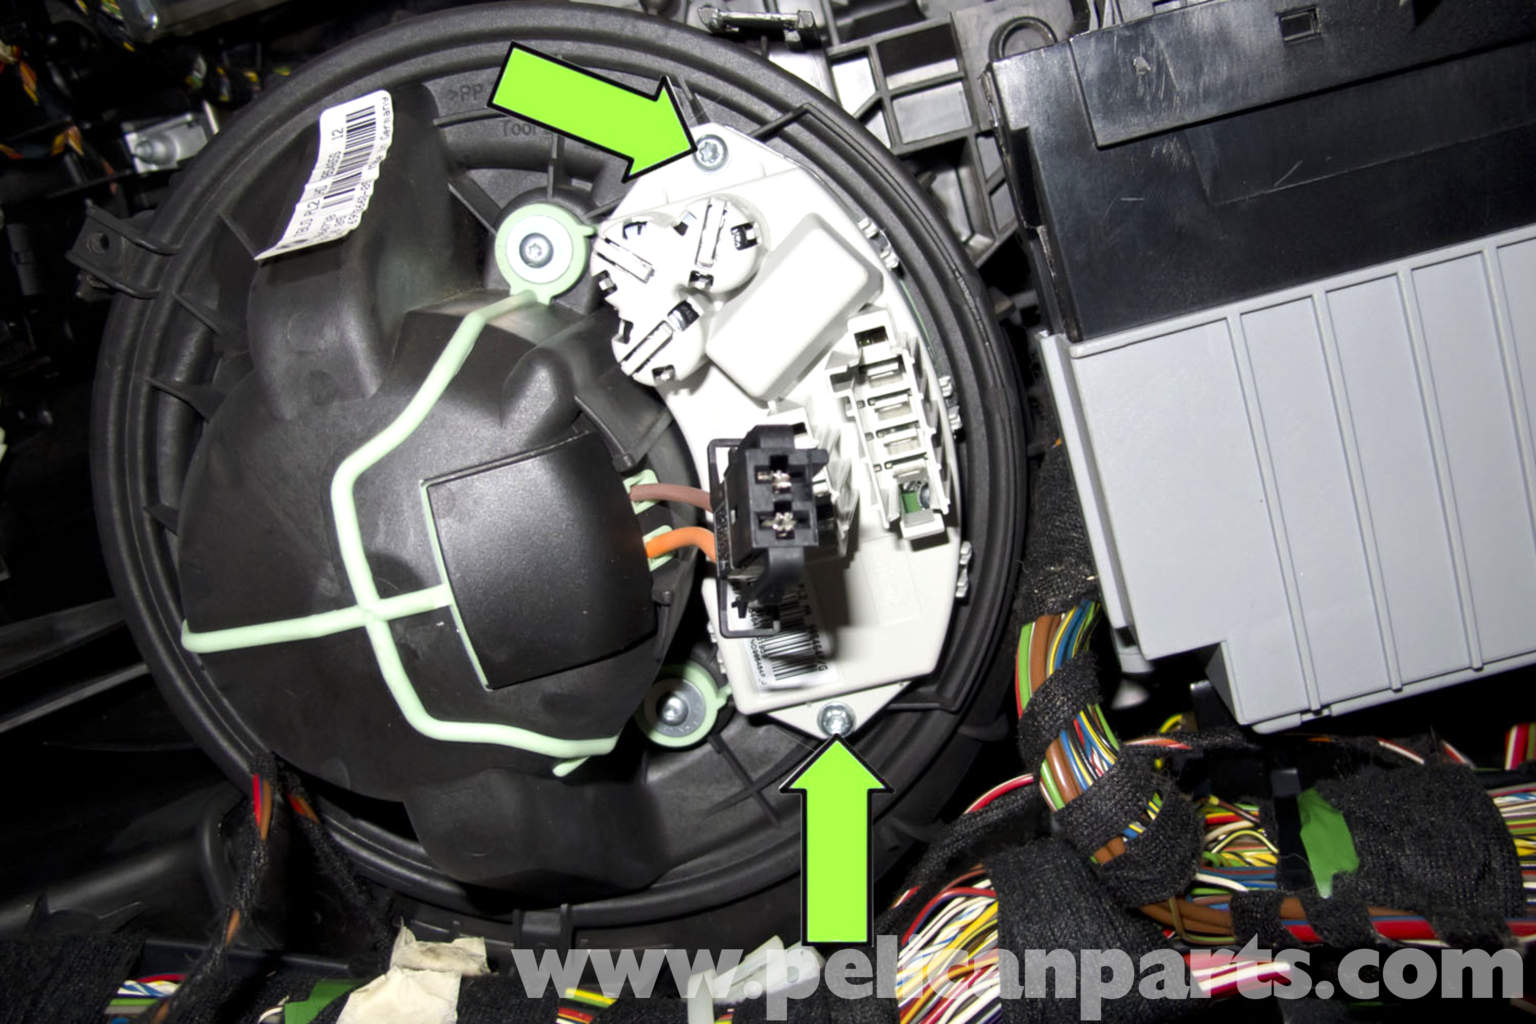 ac motor speed controller circuit diagram stove plug wiring bmw e90 blower replacement | e91, e92, e93 pelican parts diy maintenance article